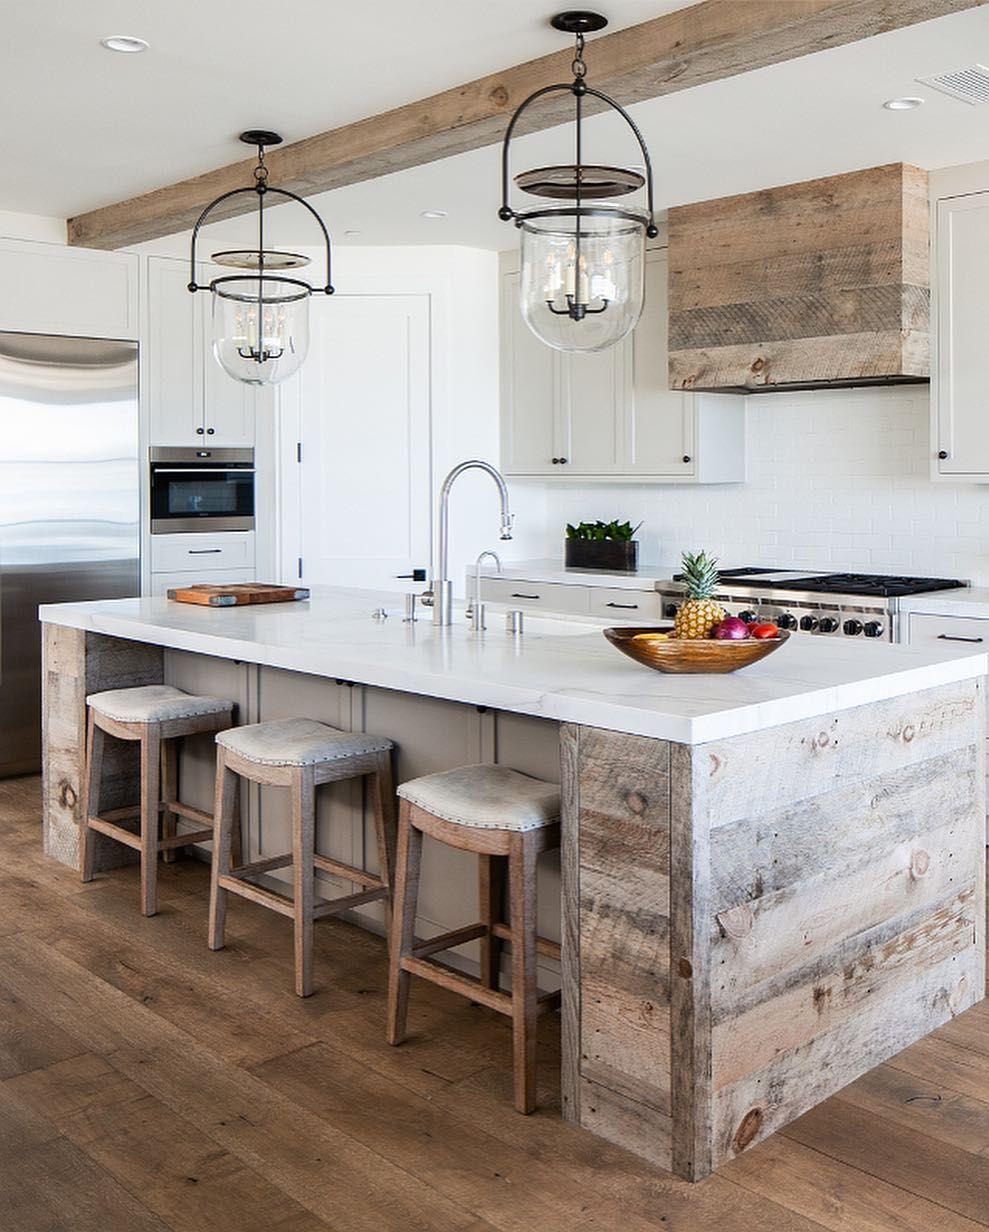 Home Bunch On Instagram Today On Home Bunch Kitchen Cabinetry Details The Kitchen Combines W Design De Cuisine Rustique Cuisine Moderne Cuisine Rustique